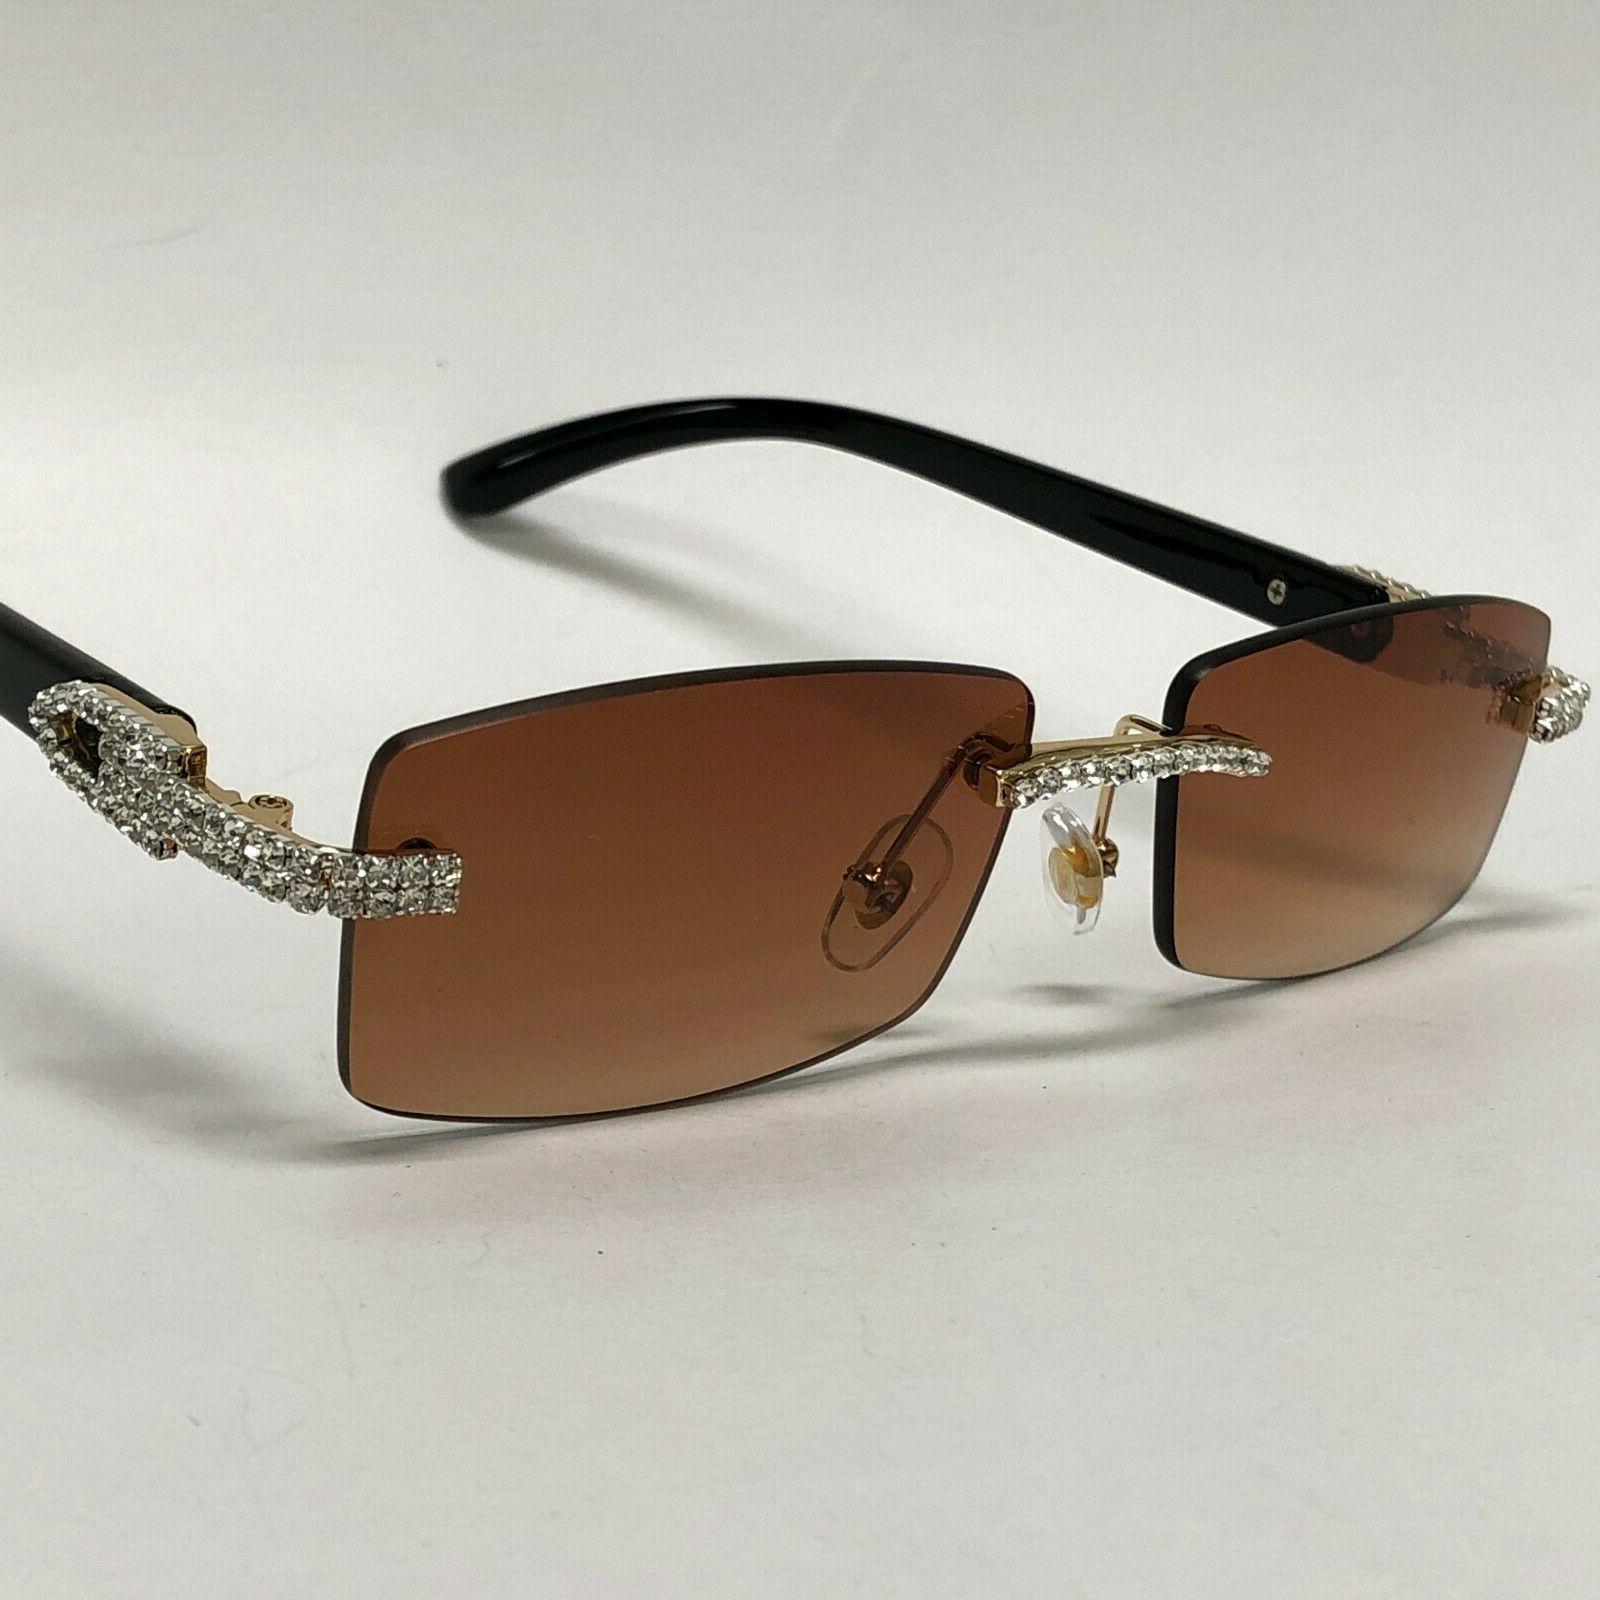 Men's Glasses Rhinestone Classy Exotic